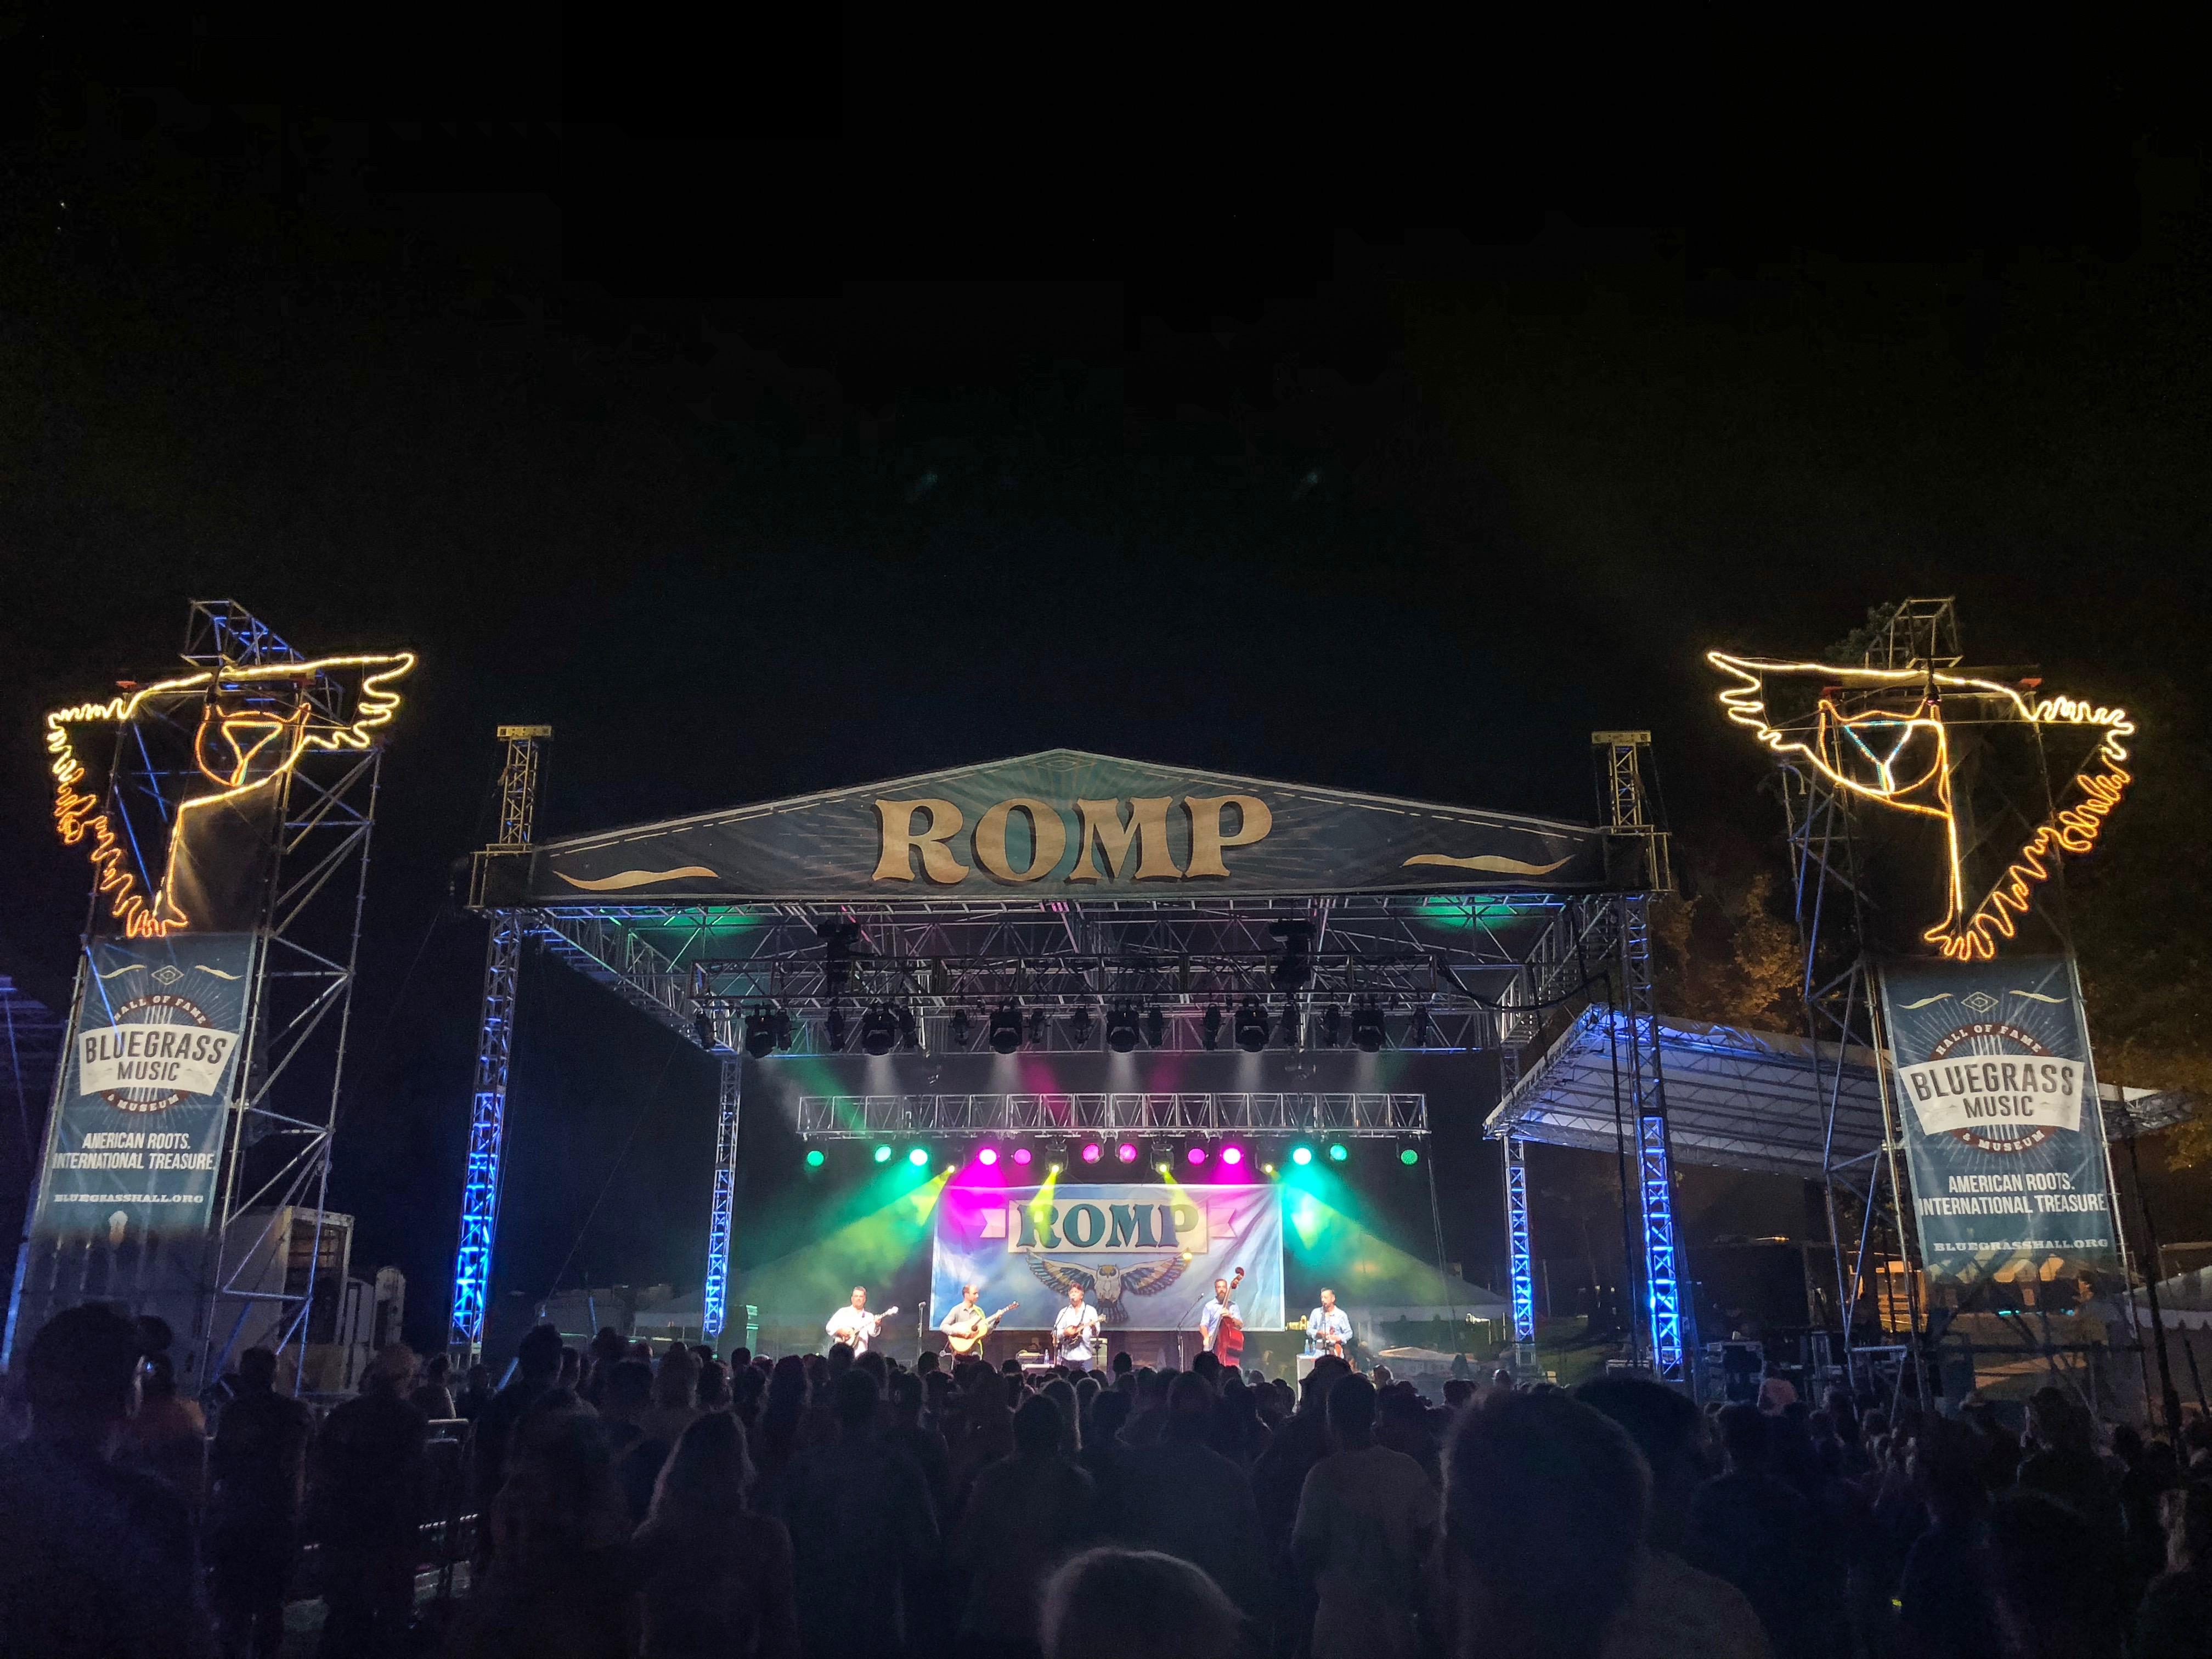 ROMP 2018 in Photographs